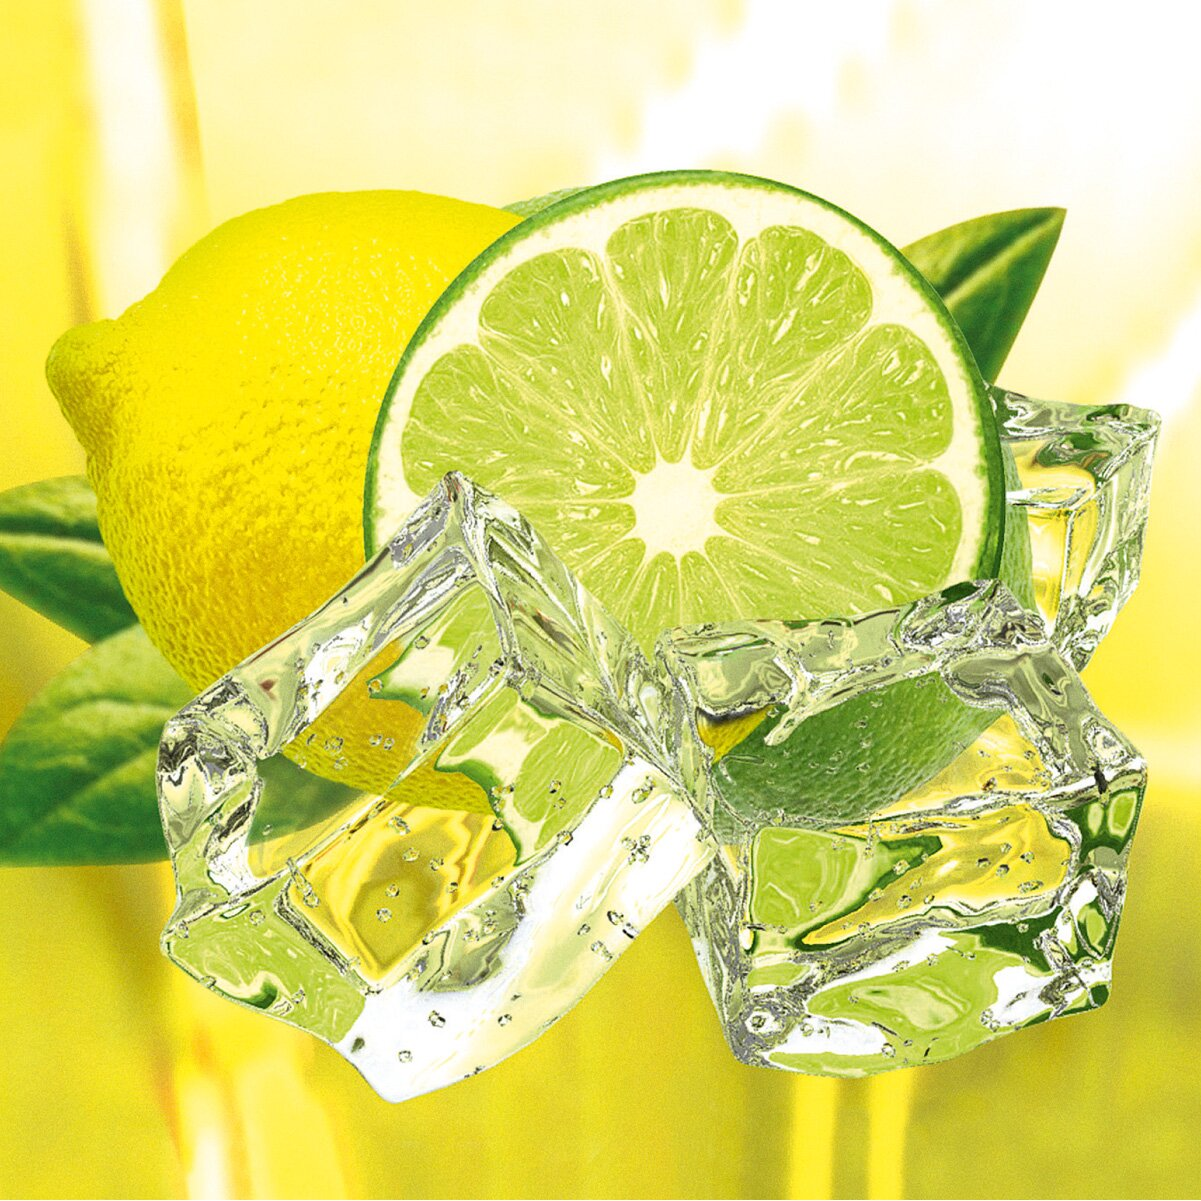 Eurographics glasbild decoglass grafikdruck von fresh lemon and lime reviews - Deco glace ...